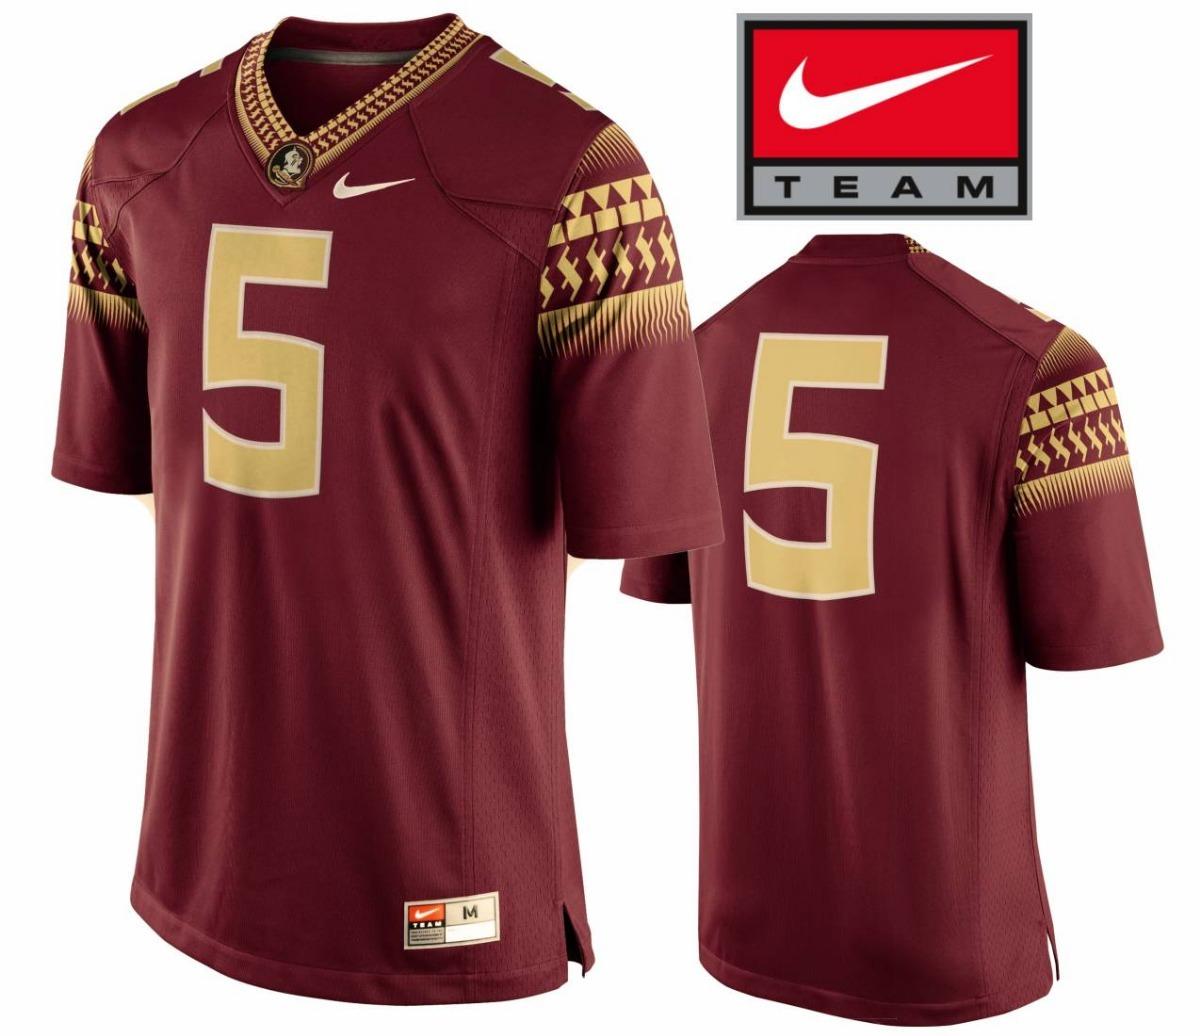 Camiseta Futbol Americano Universidad Florida Tall 14 15 Año ... 034d38ba108